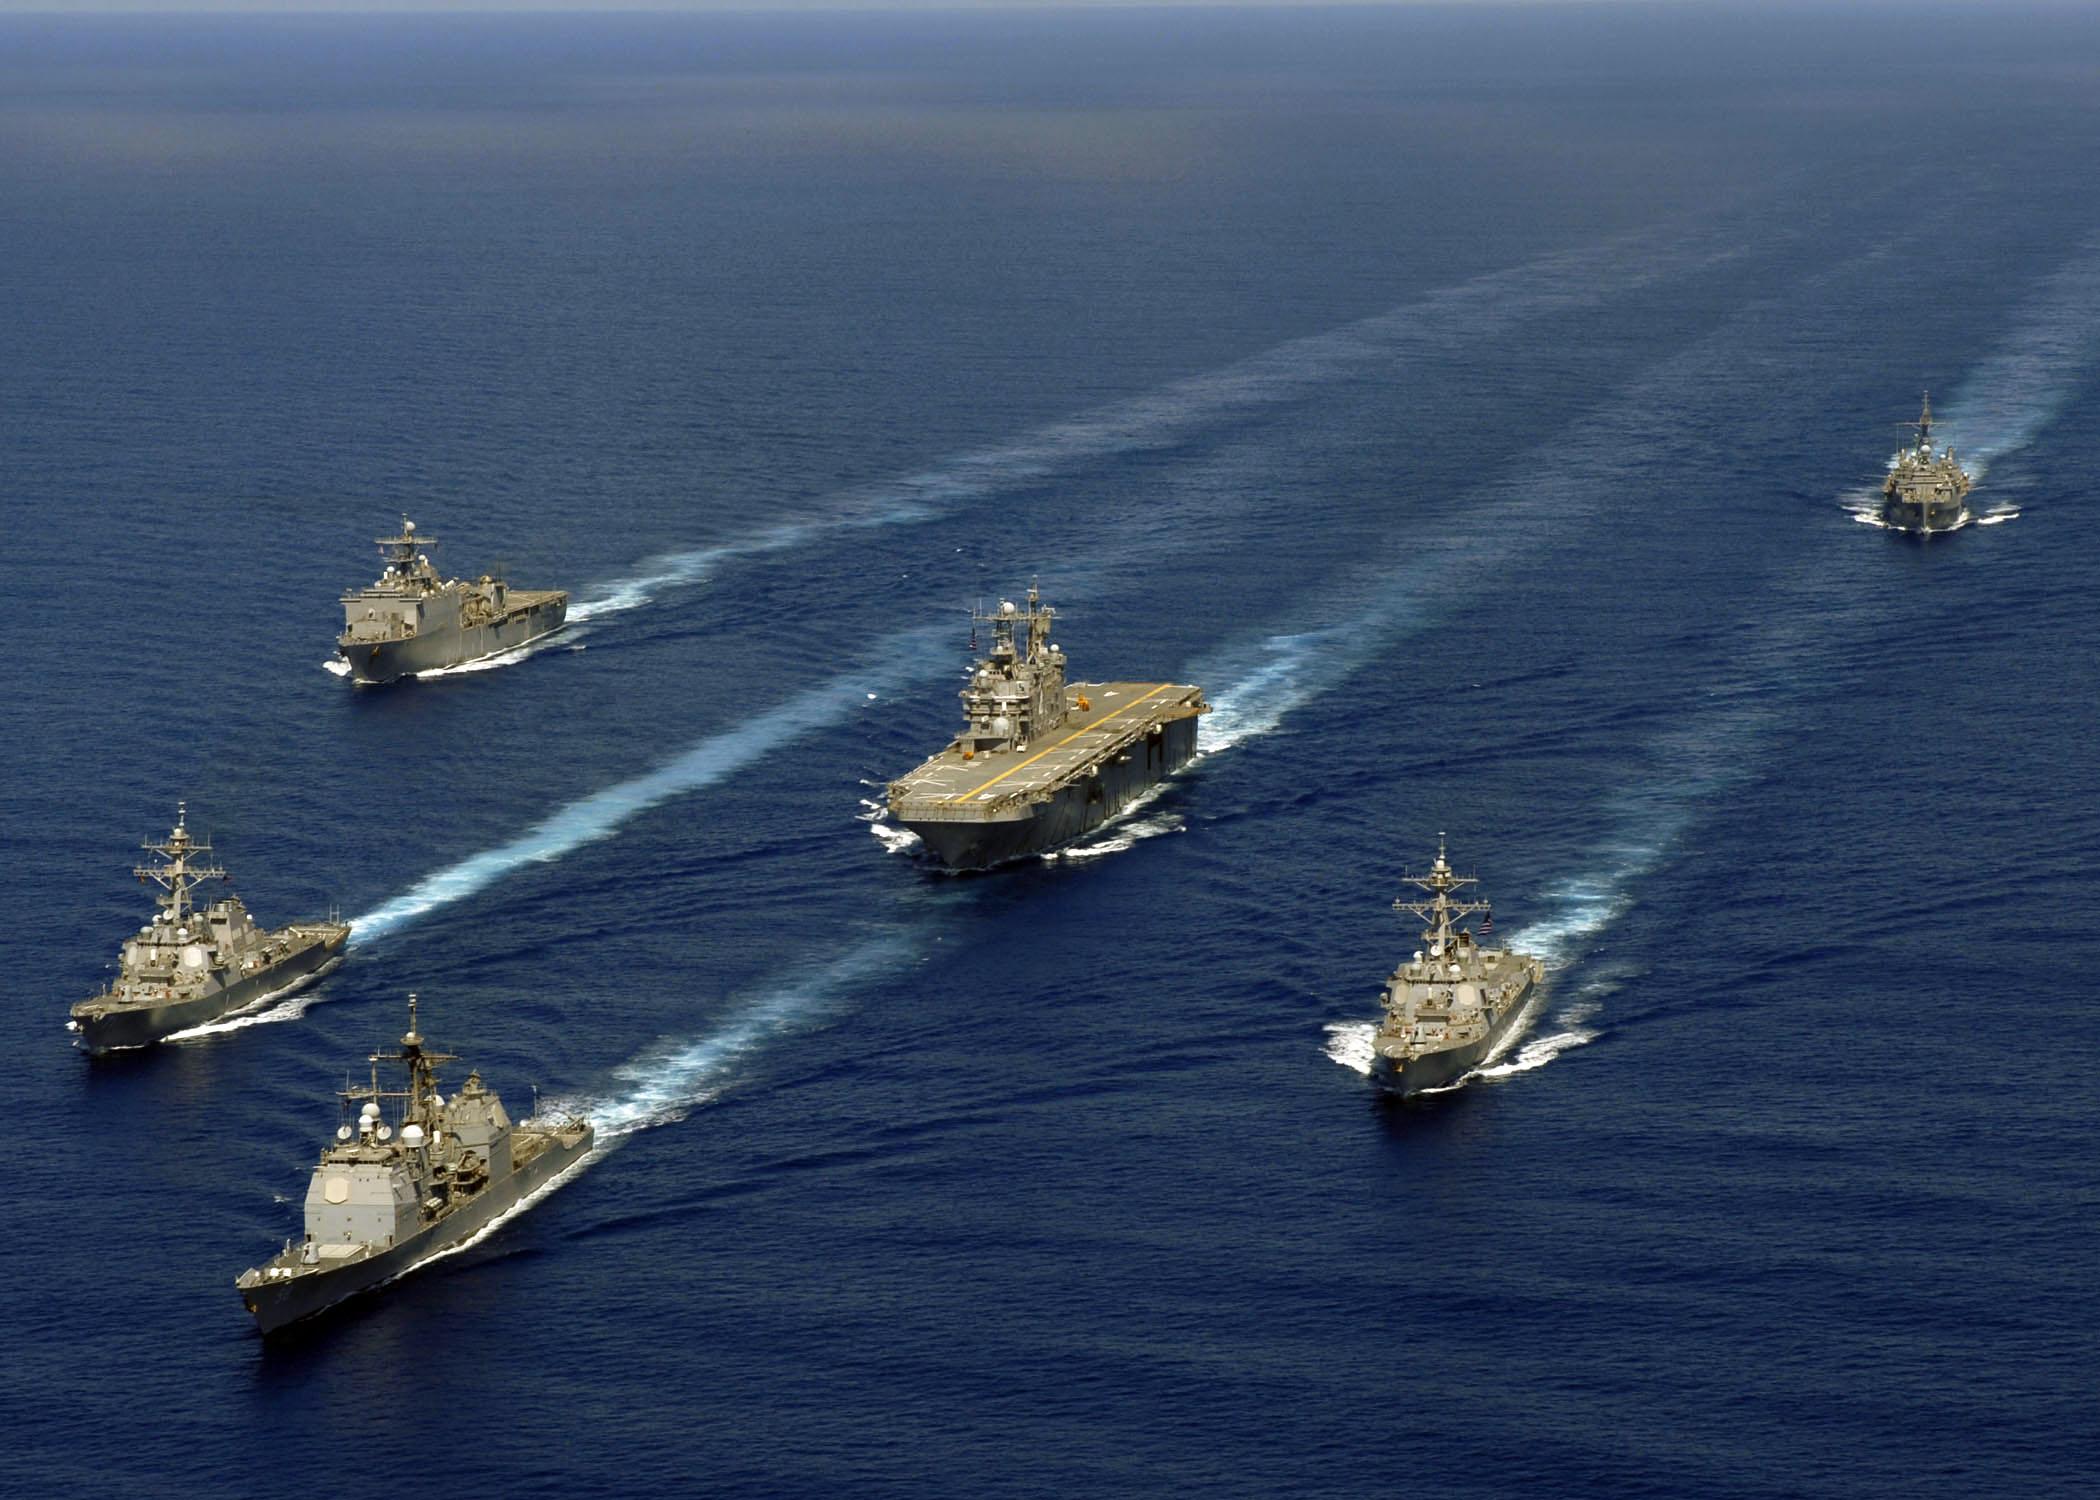 File:US Navy 080705-N-2735T-542 The Nassau Strike Group (NASSG) transits the Atlantic Ocean.jpg